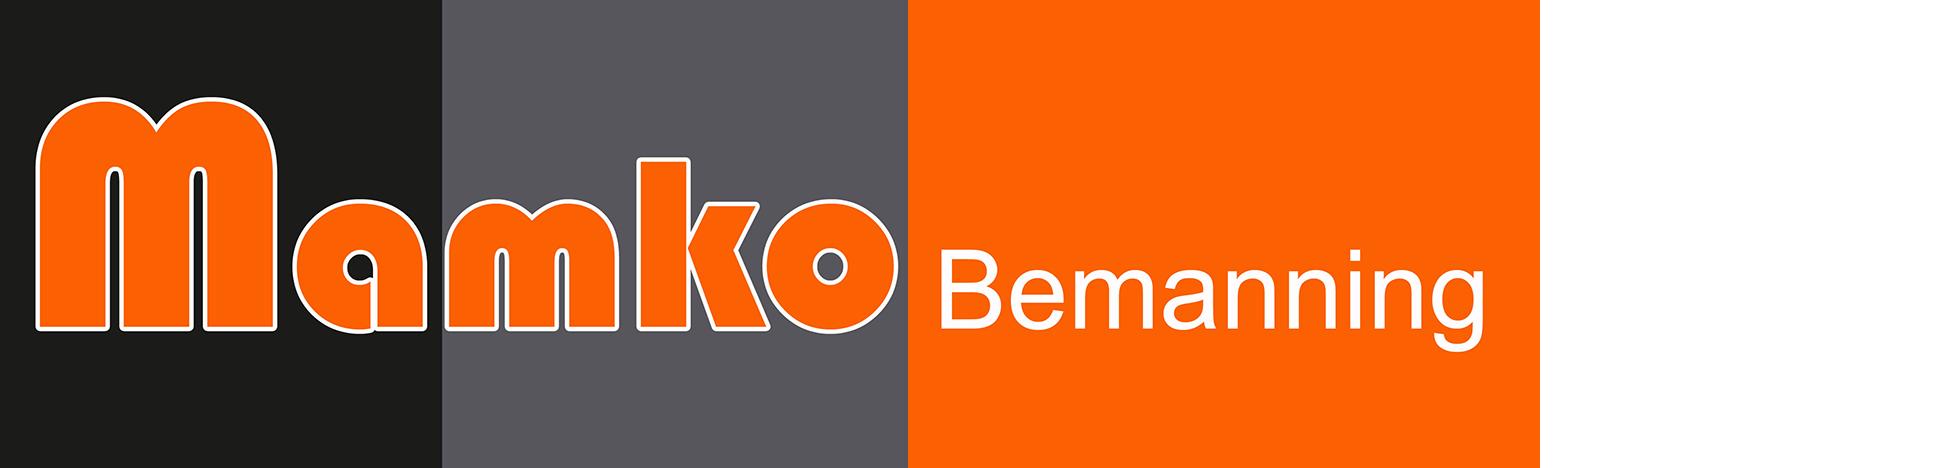 Mamko Bemanning